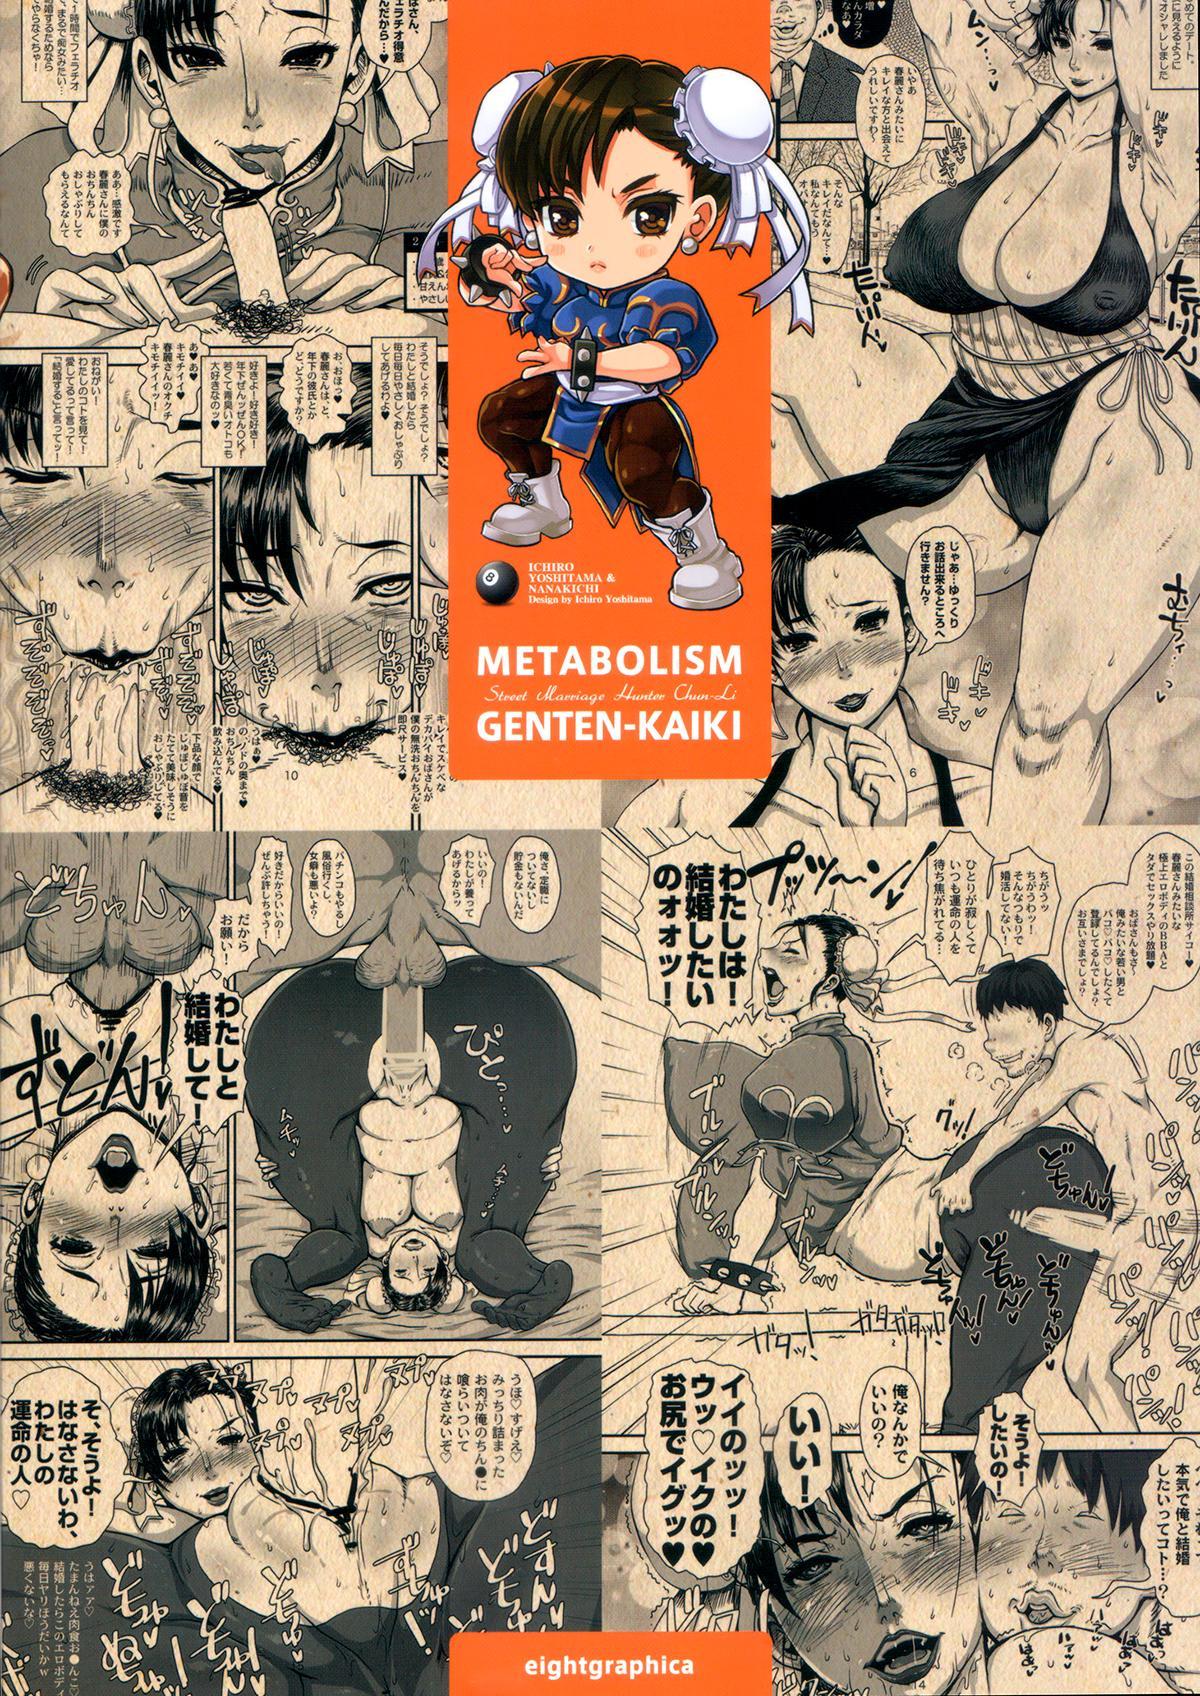 (C87) [8graphica (Yoshitama Ichirou, Nanakichi)] METABOLISM Chun-Li A Beautiful and Mature Chun-Li-san has Serious Sex with the Candidates while Looking For a Marriage Partner. (Street Fighter) [English] [biribiri] 25